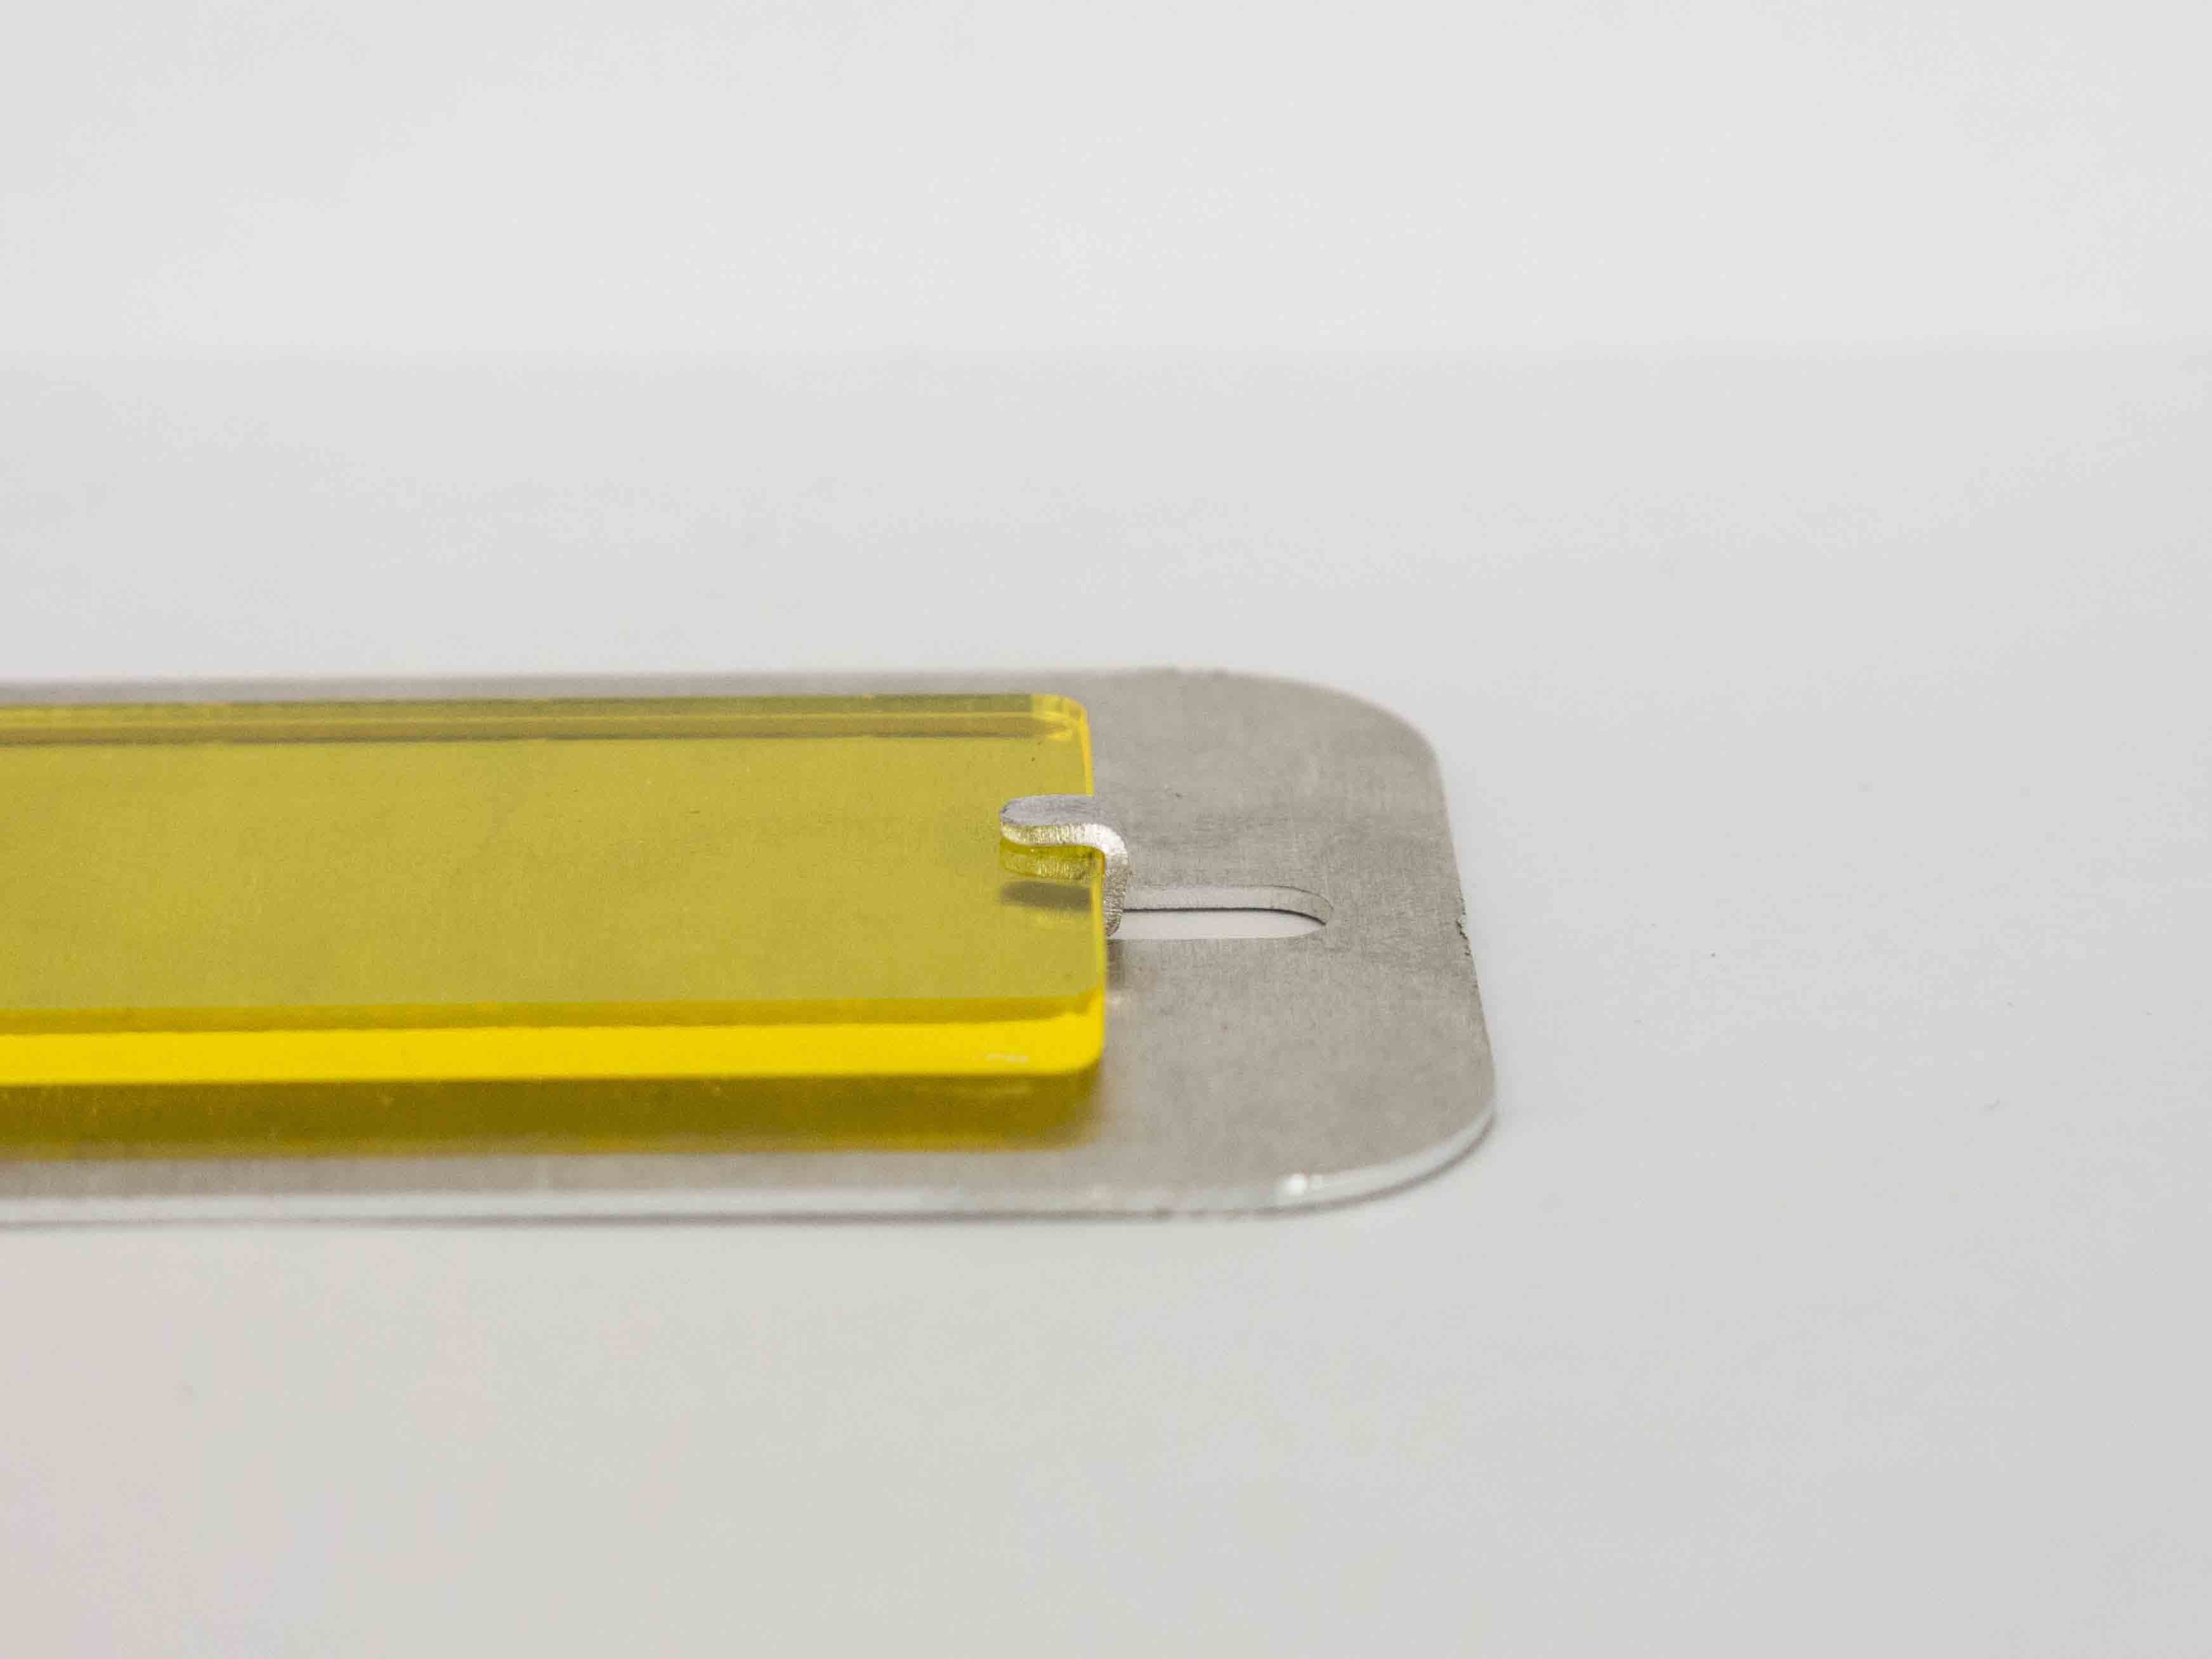 laser cut metal fastening multi material side